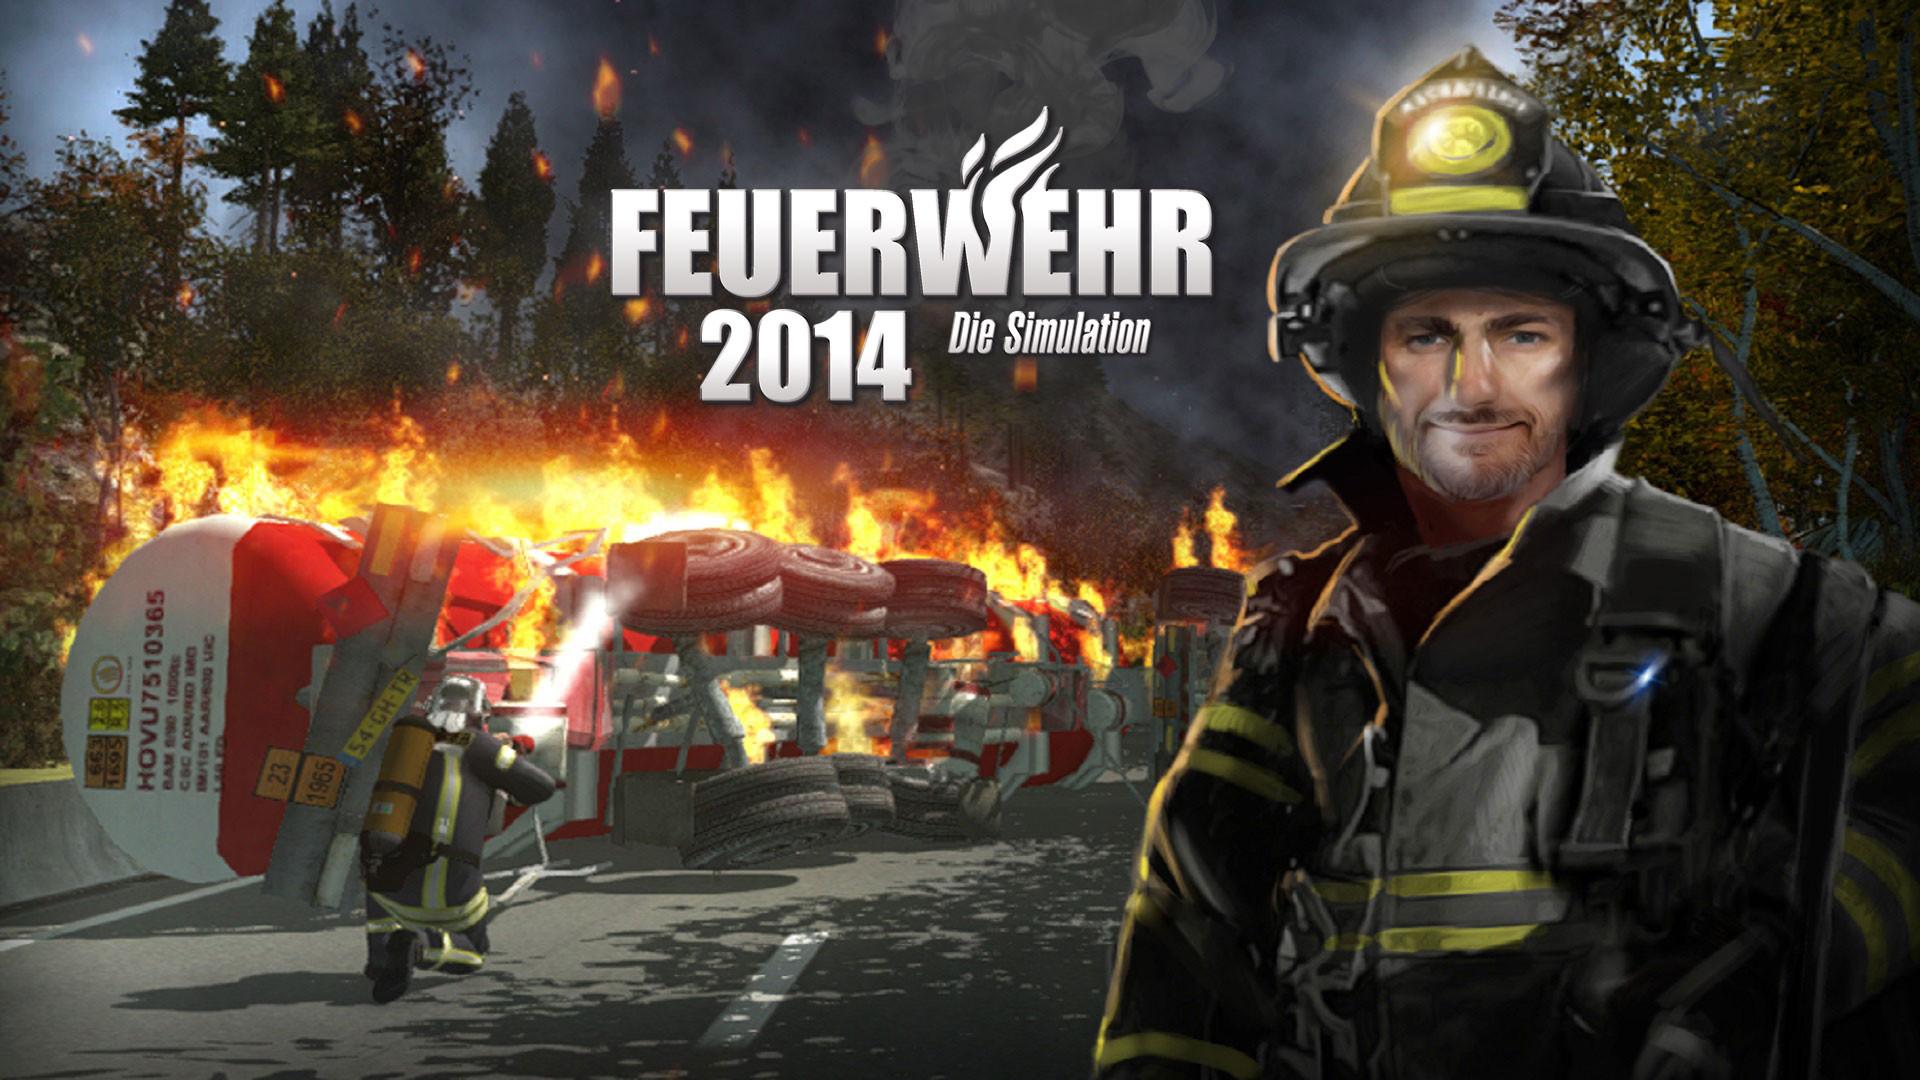 Firefighter Wallpaper for Firefighter Wallpaper Hd. Feuerwehr 2014: Die  Simulation | Simulator PC Spiel .